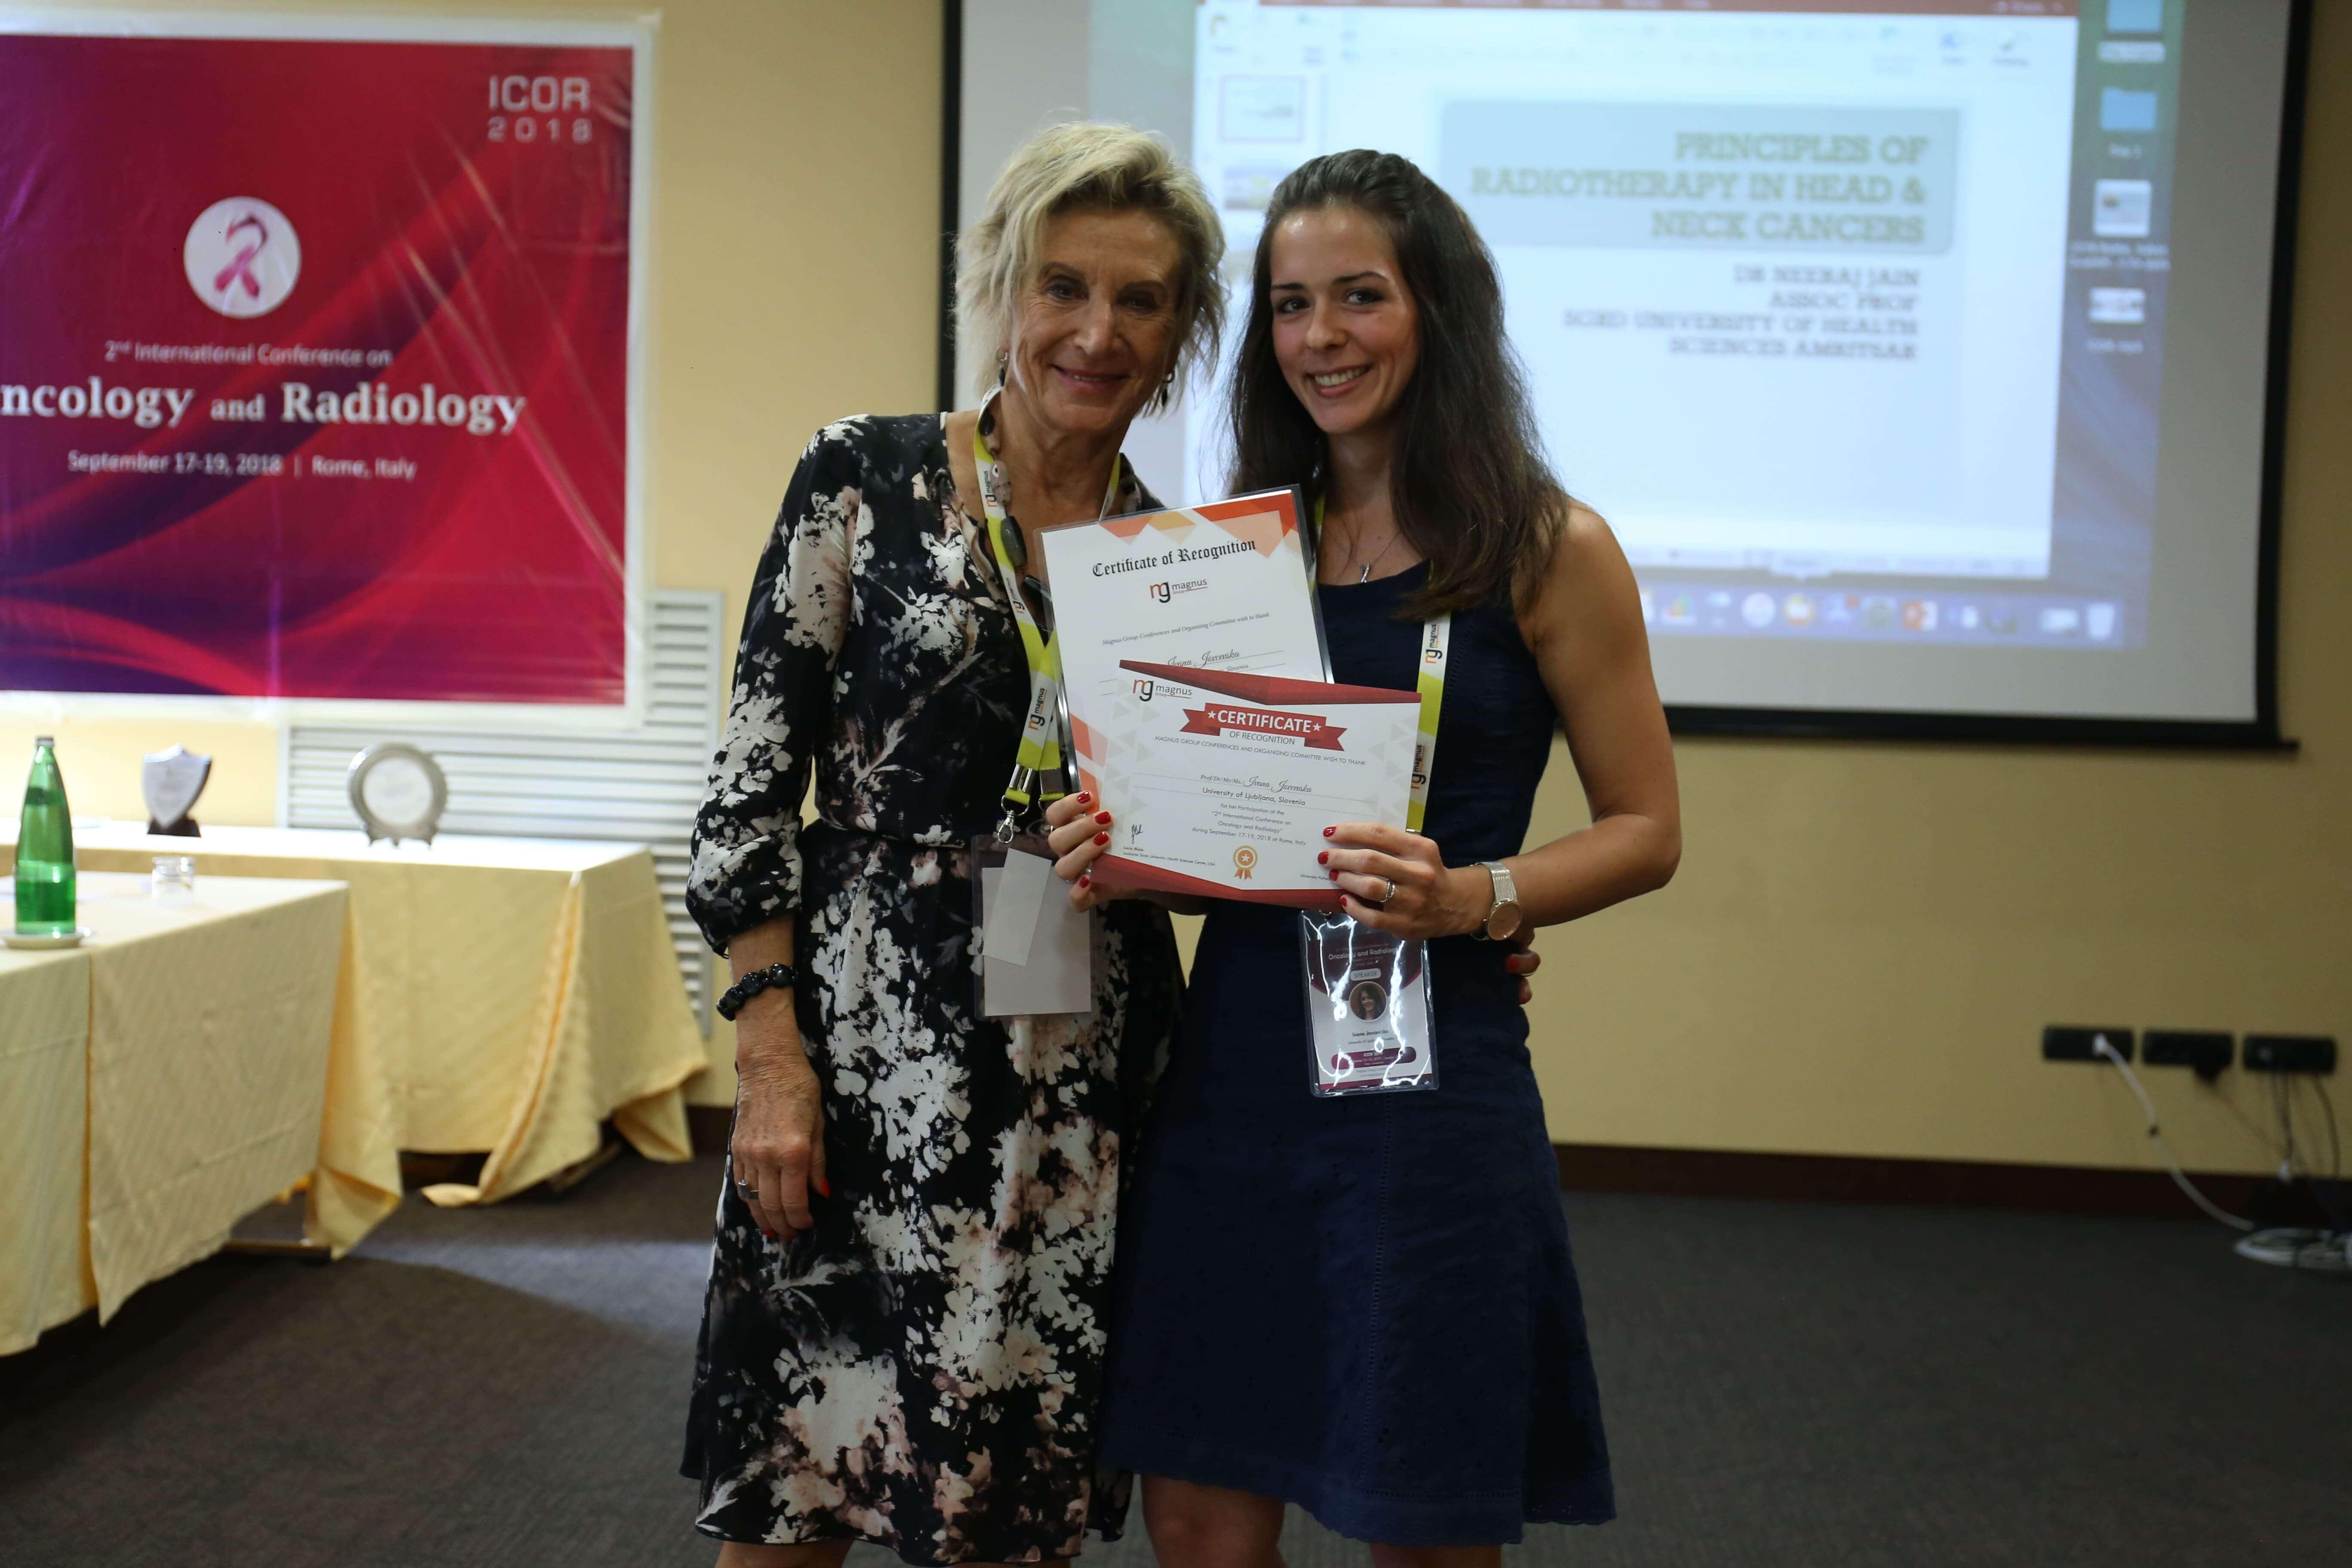 Cancer research conferences - Ivana Jovcevska